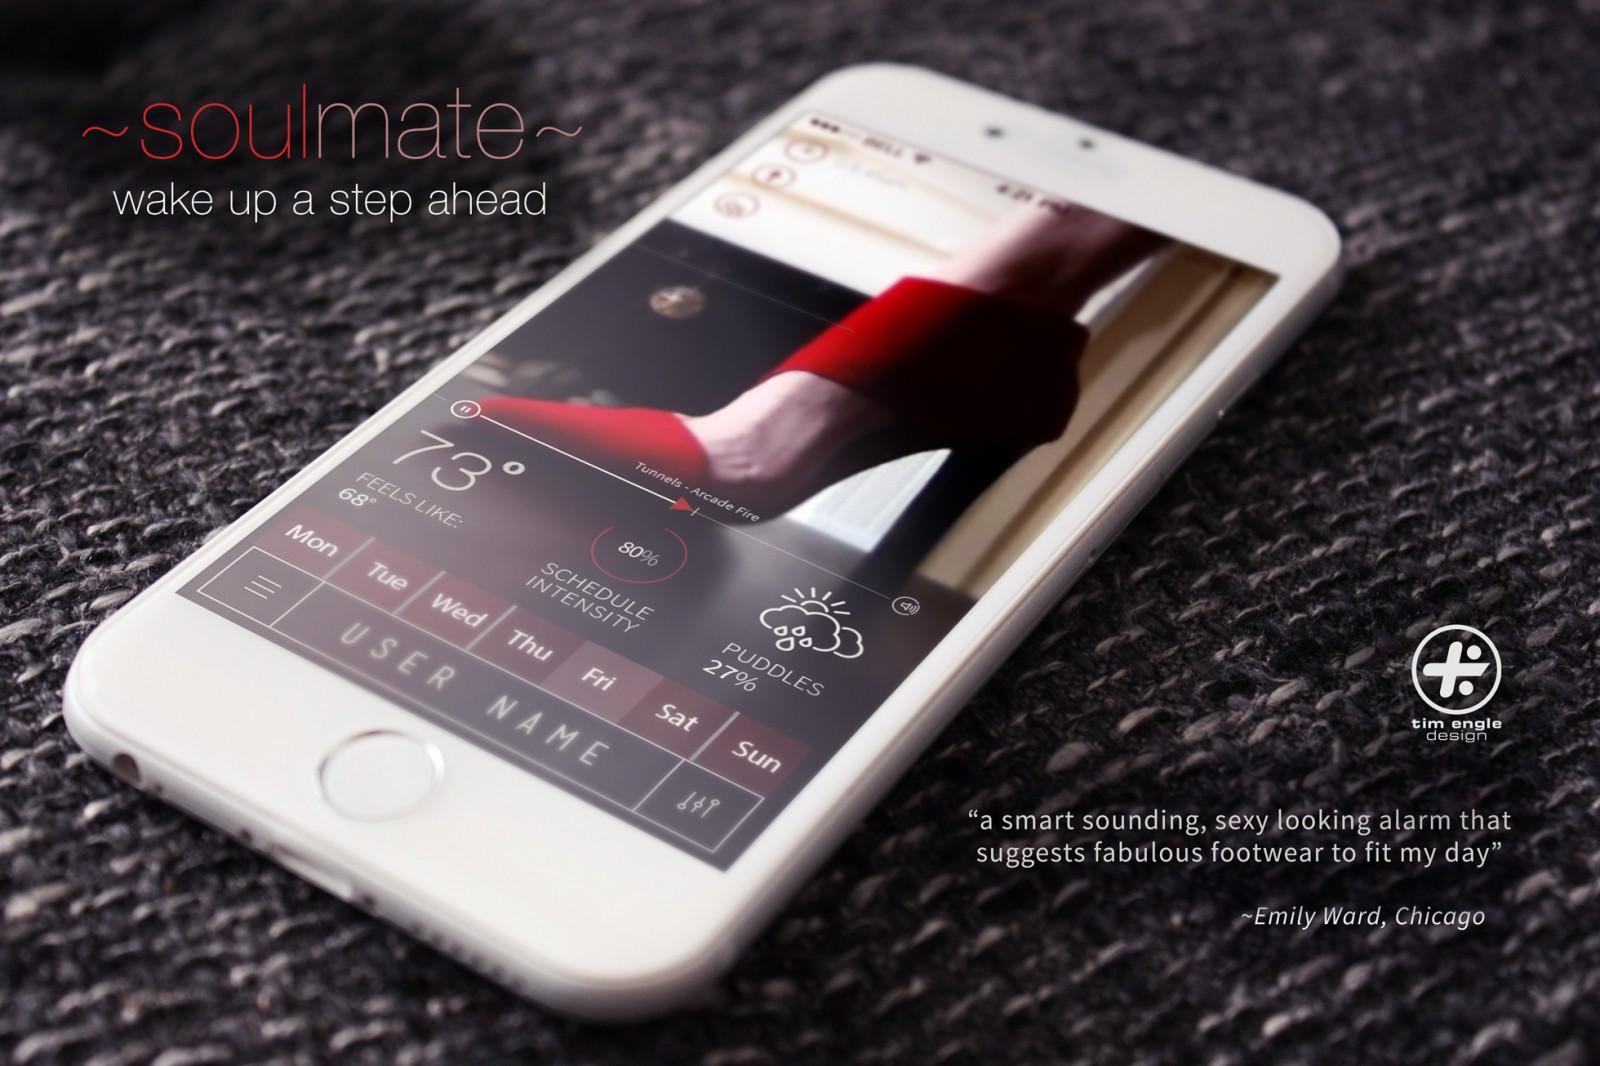 SOULMATE-iPhone-6 – Tim Engle Design